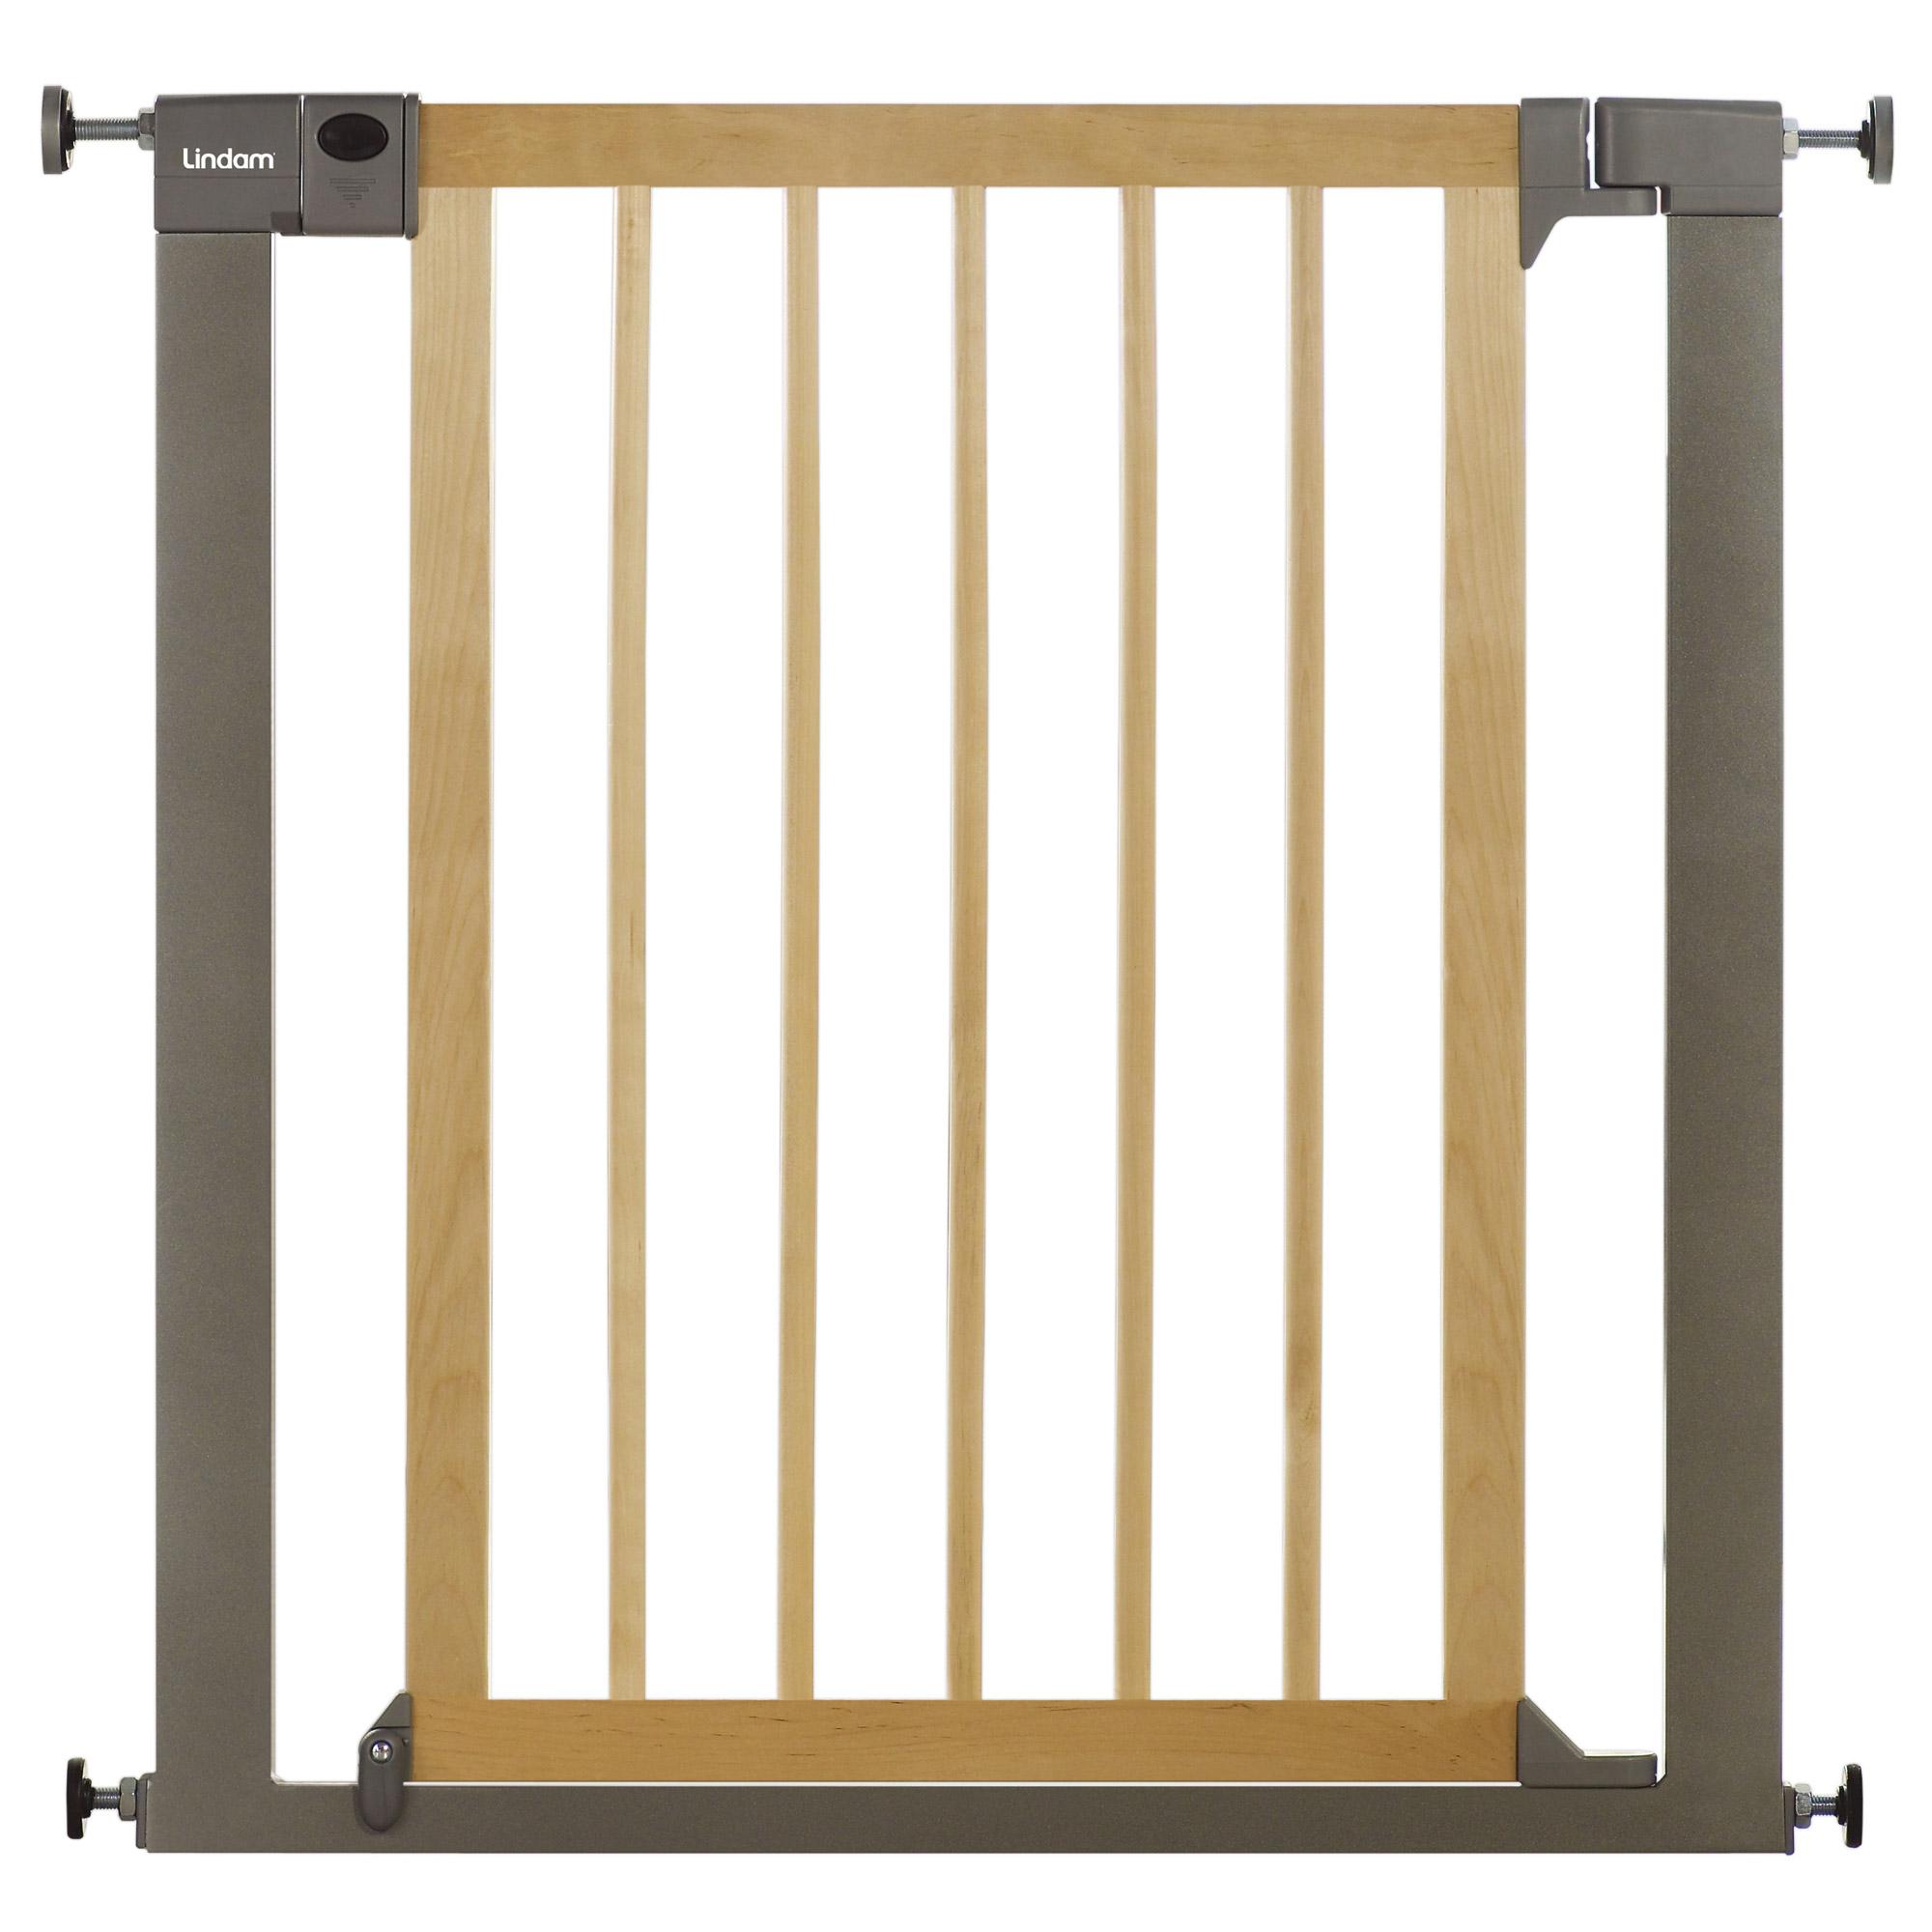 barriere securite lindam